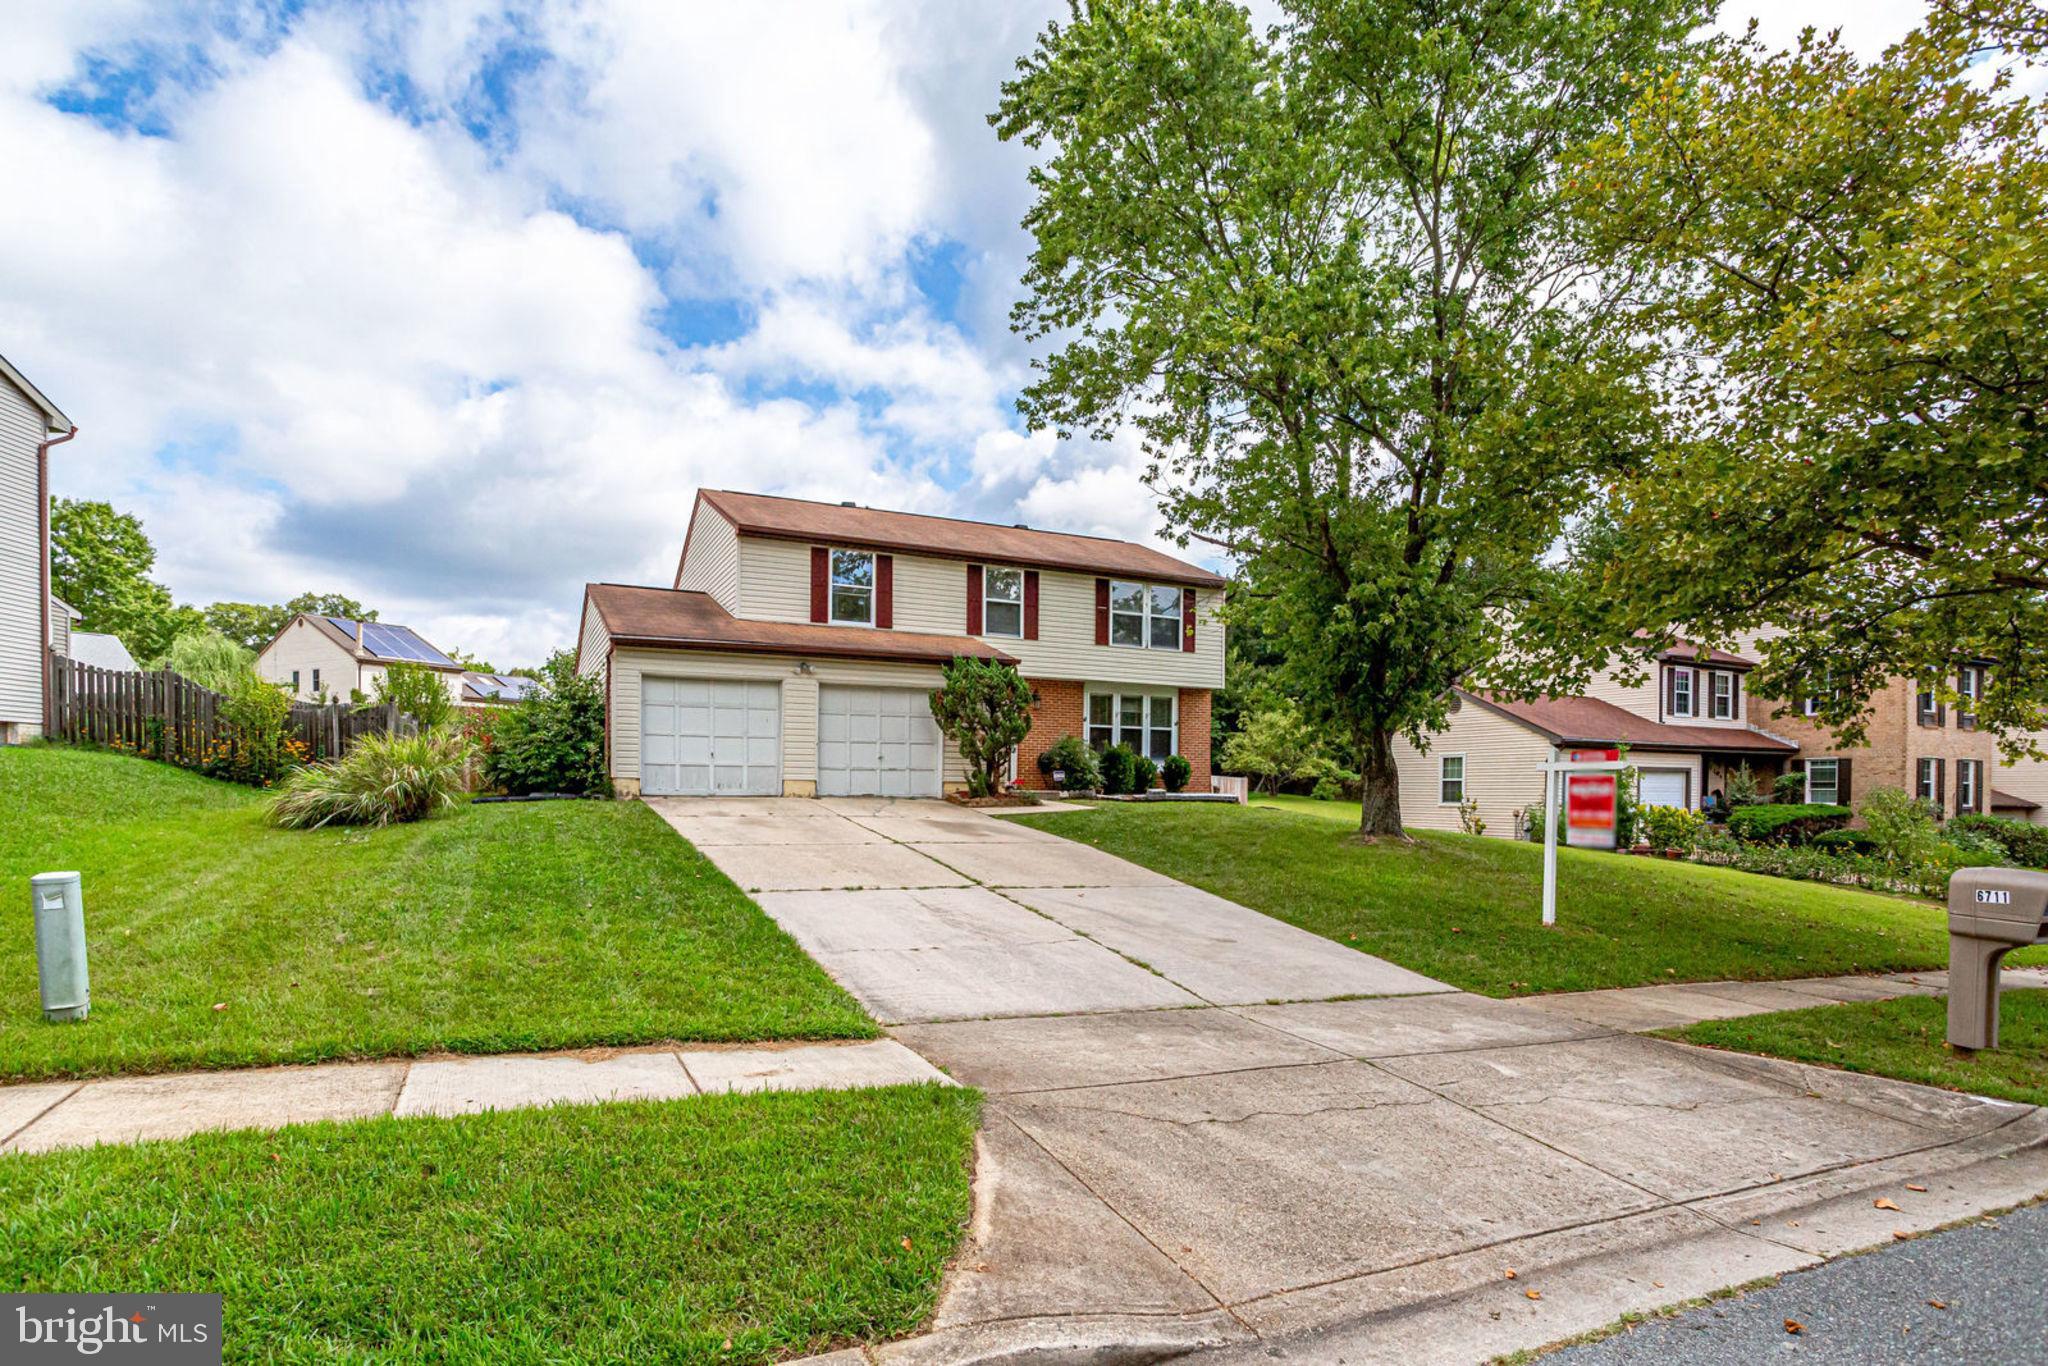 6711 Green Haven Rd, Lanham, MD, 20706